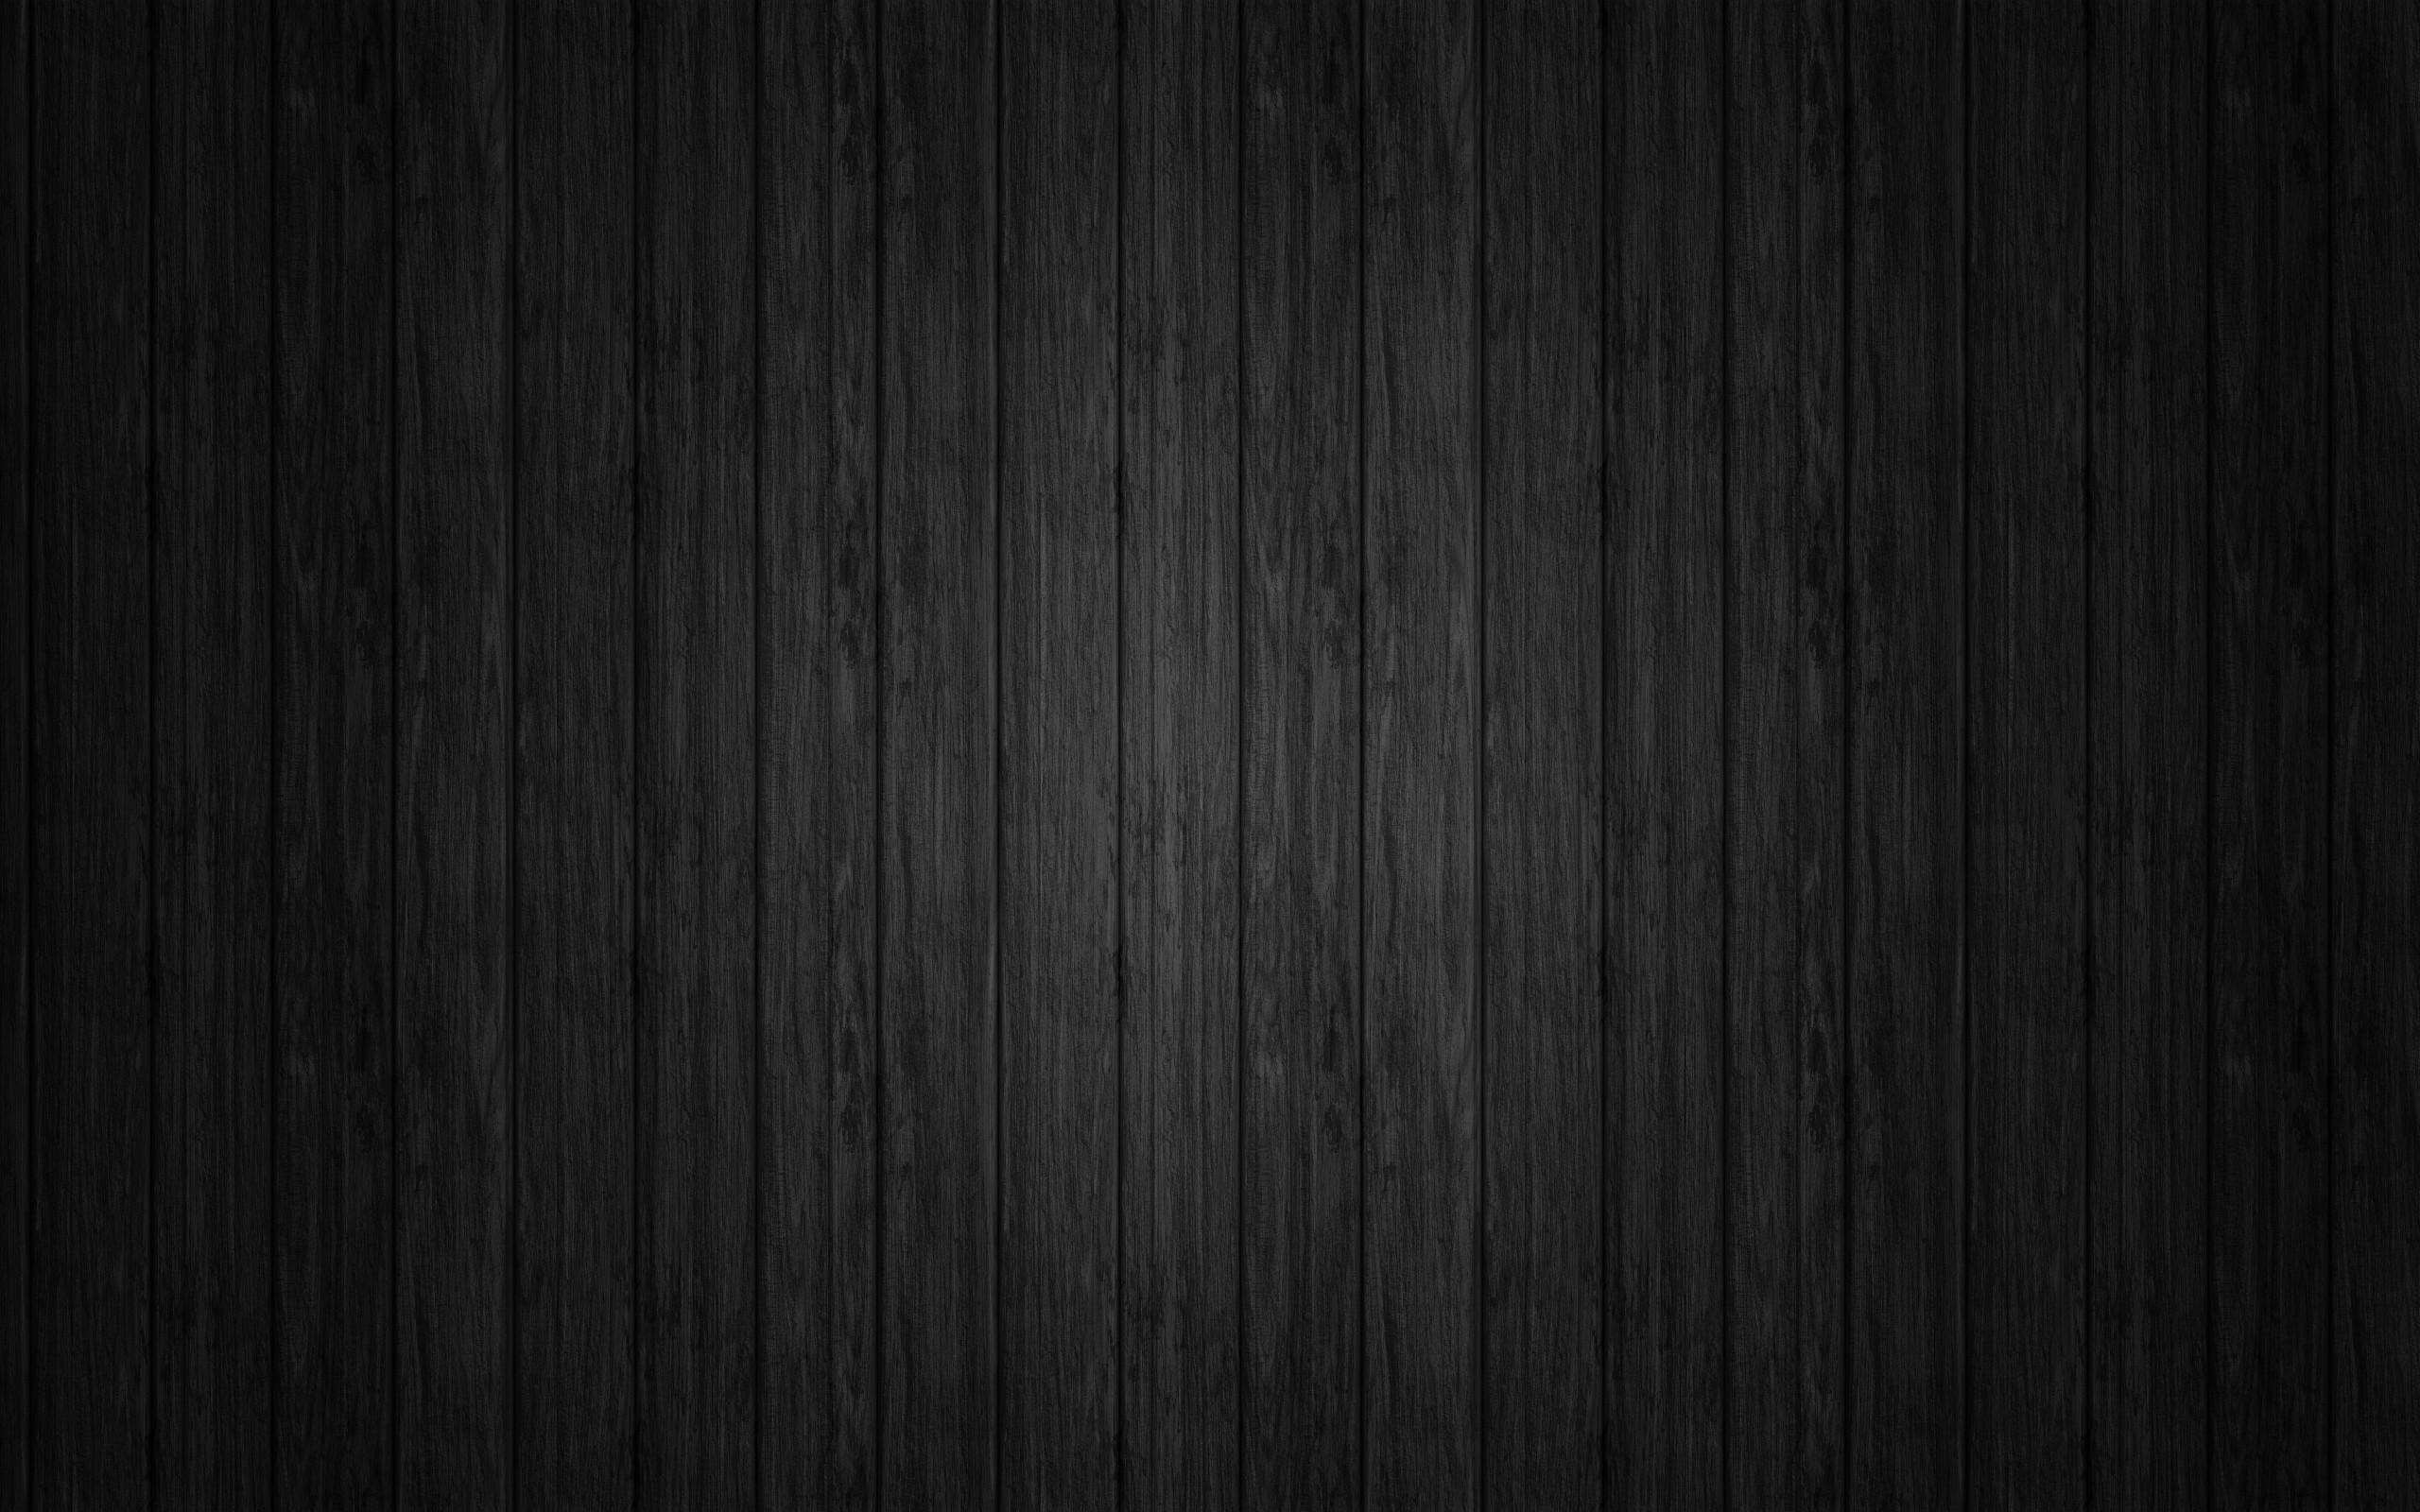 Black Floor Texture And Black Background Wallpaper X Black Background …